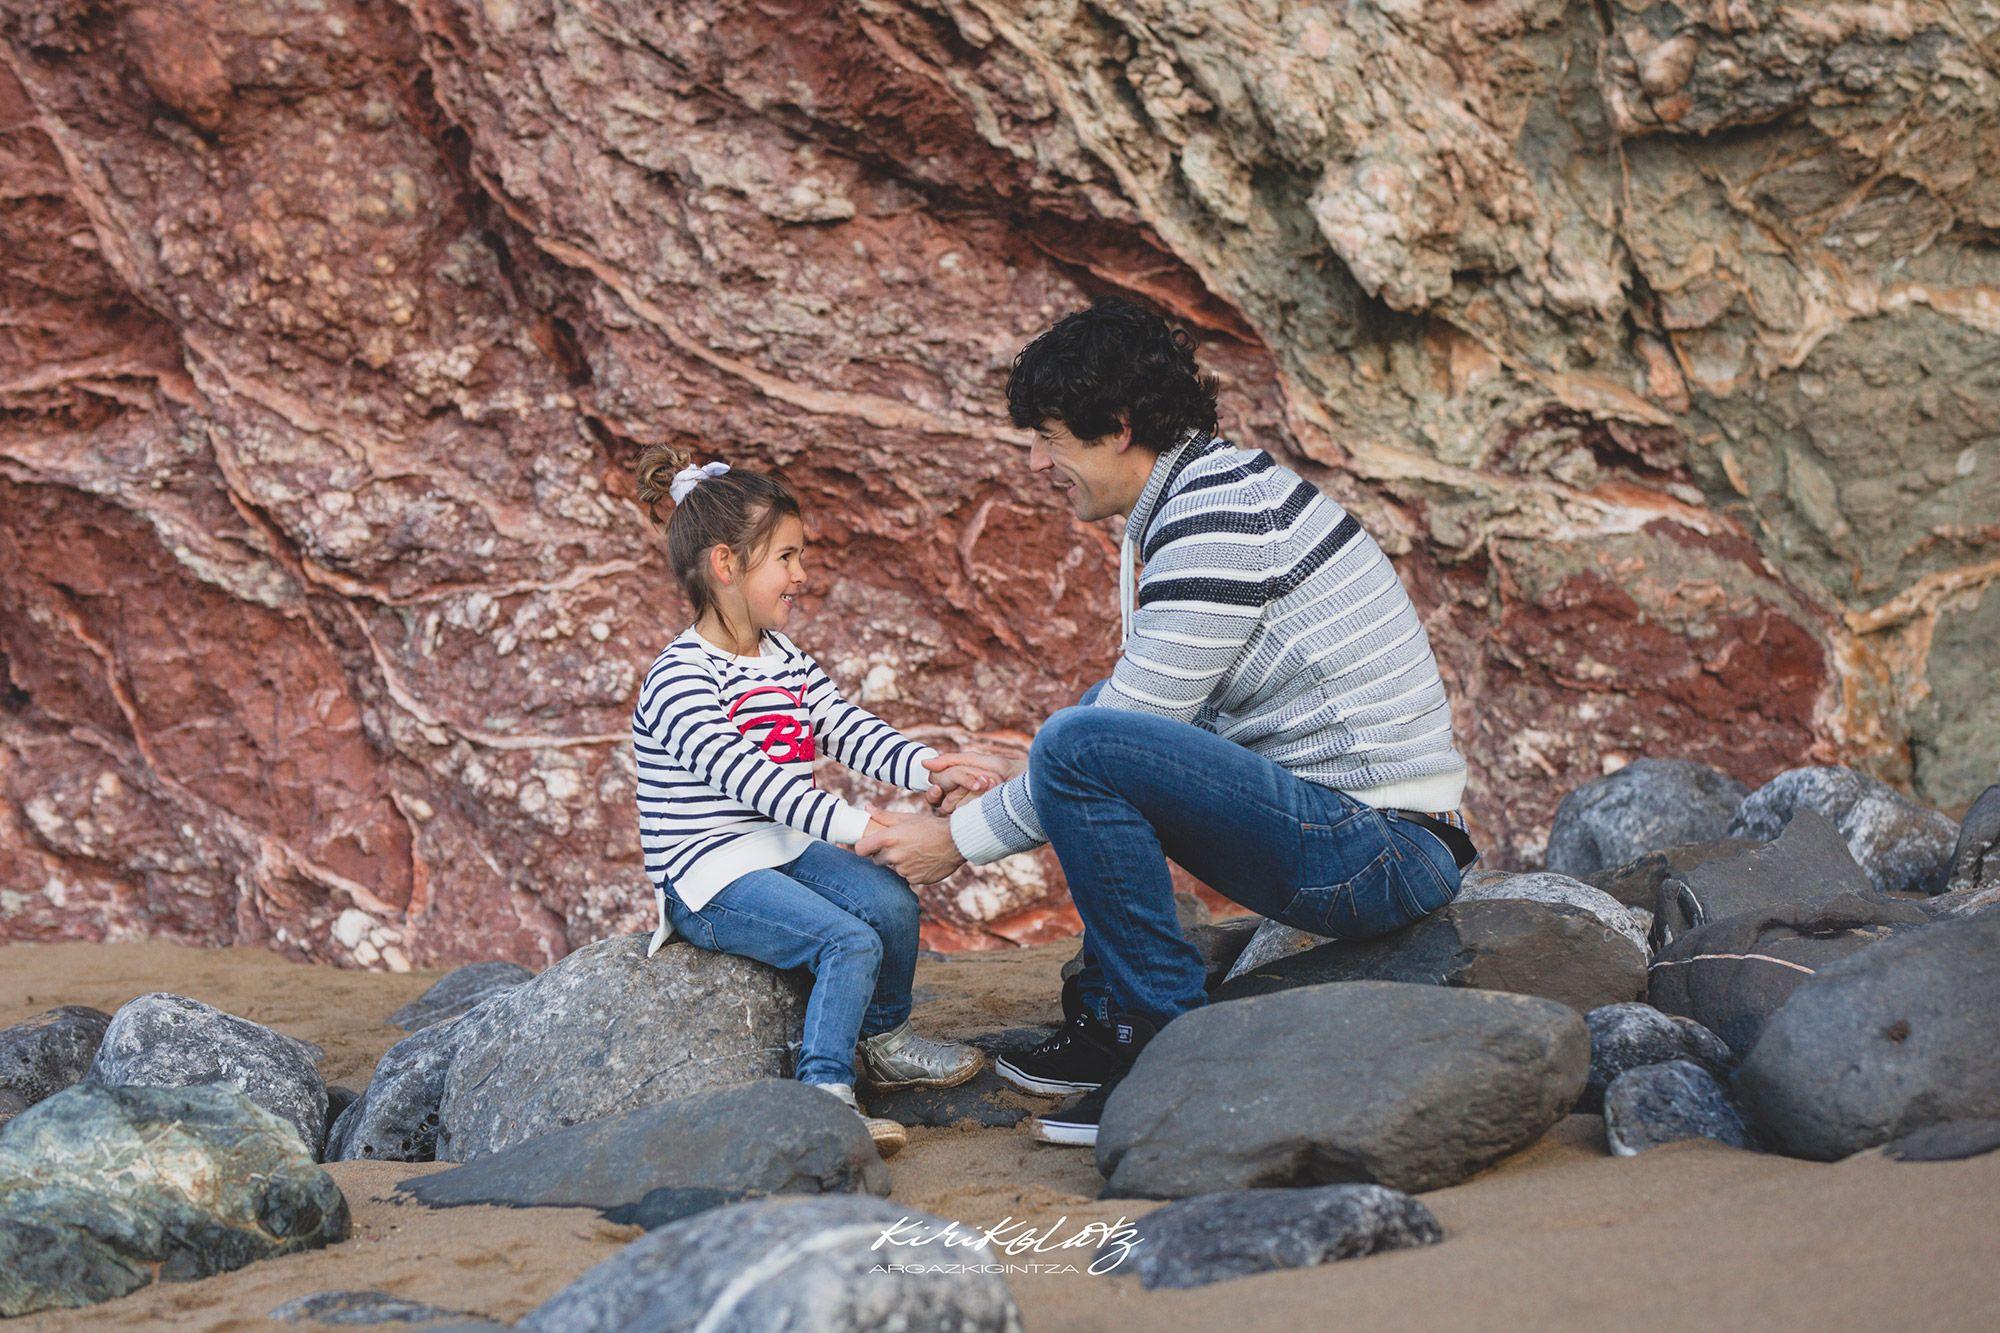 Sesiones Familias Bizkaia Fotos Playa Bakio Bizkaia Fotografa Kirikolatz